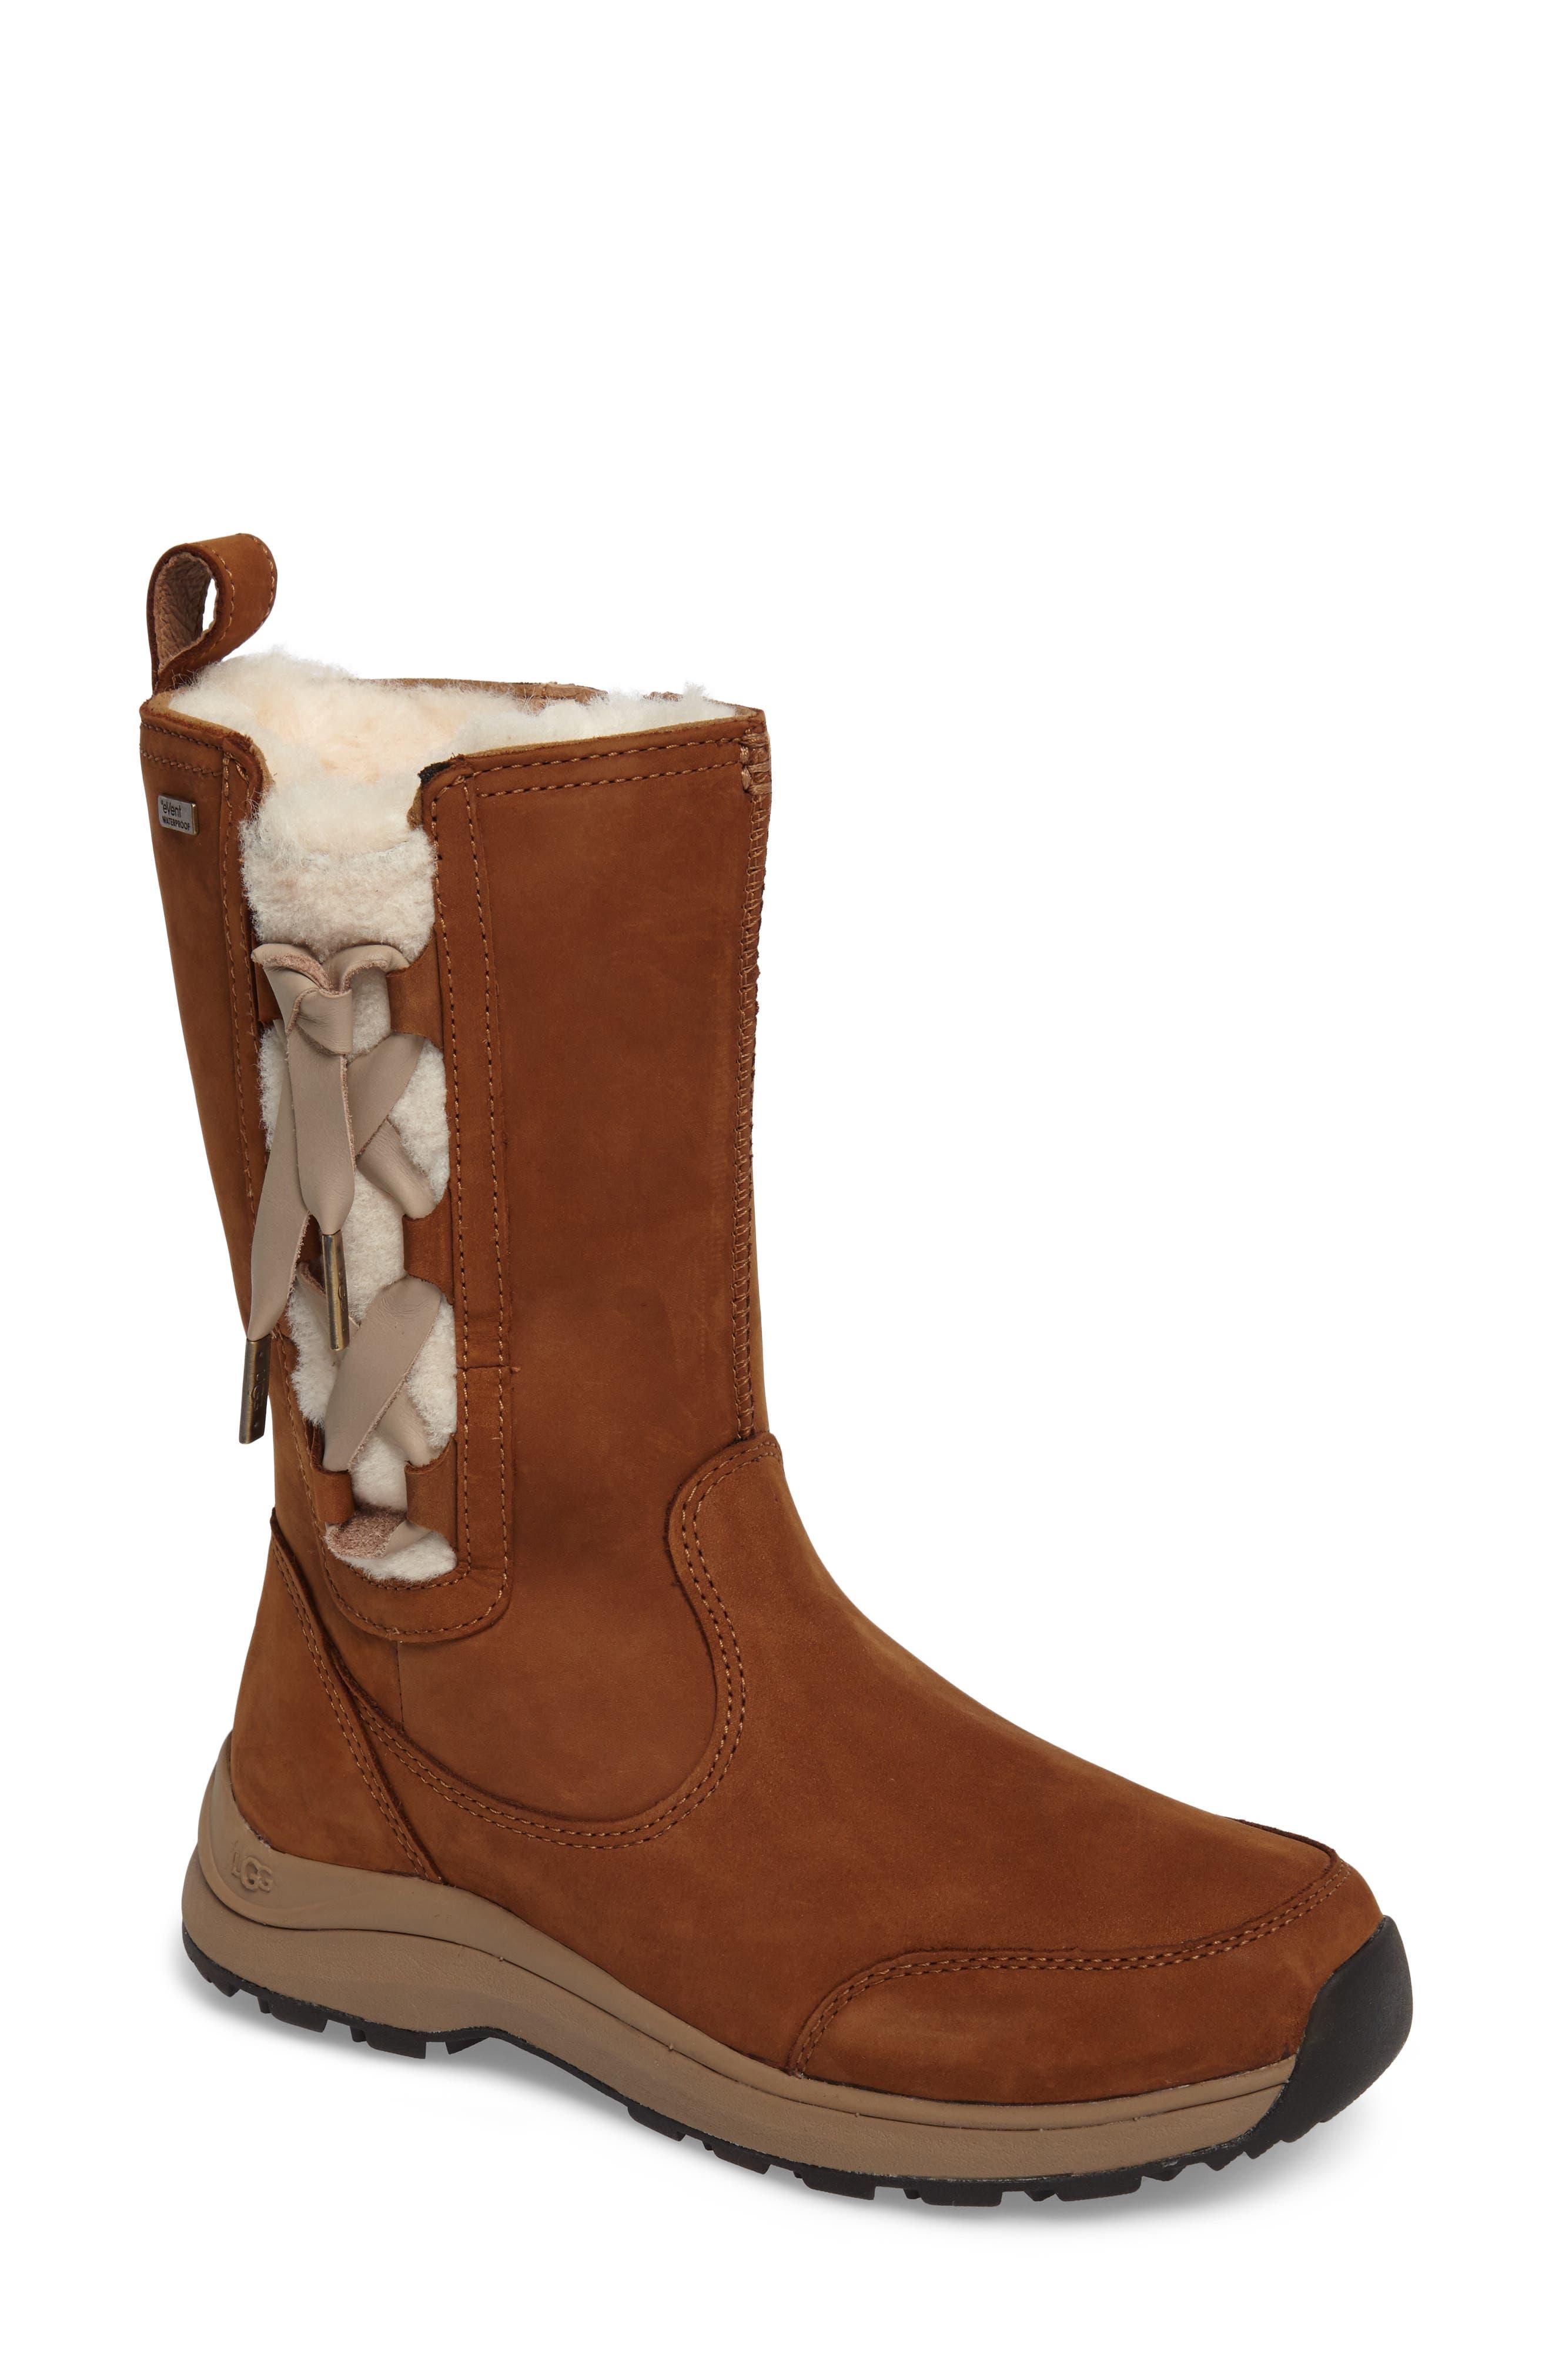 Alternate Image 1 Selected - UGG® Suvi Waterproof Insulated Winter Boot (Women)